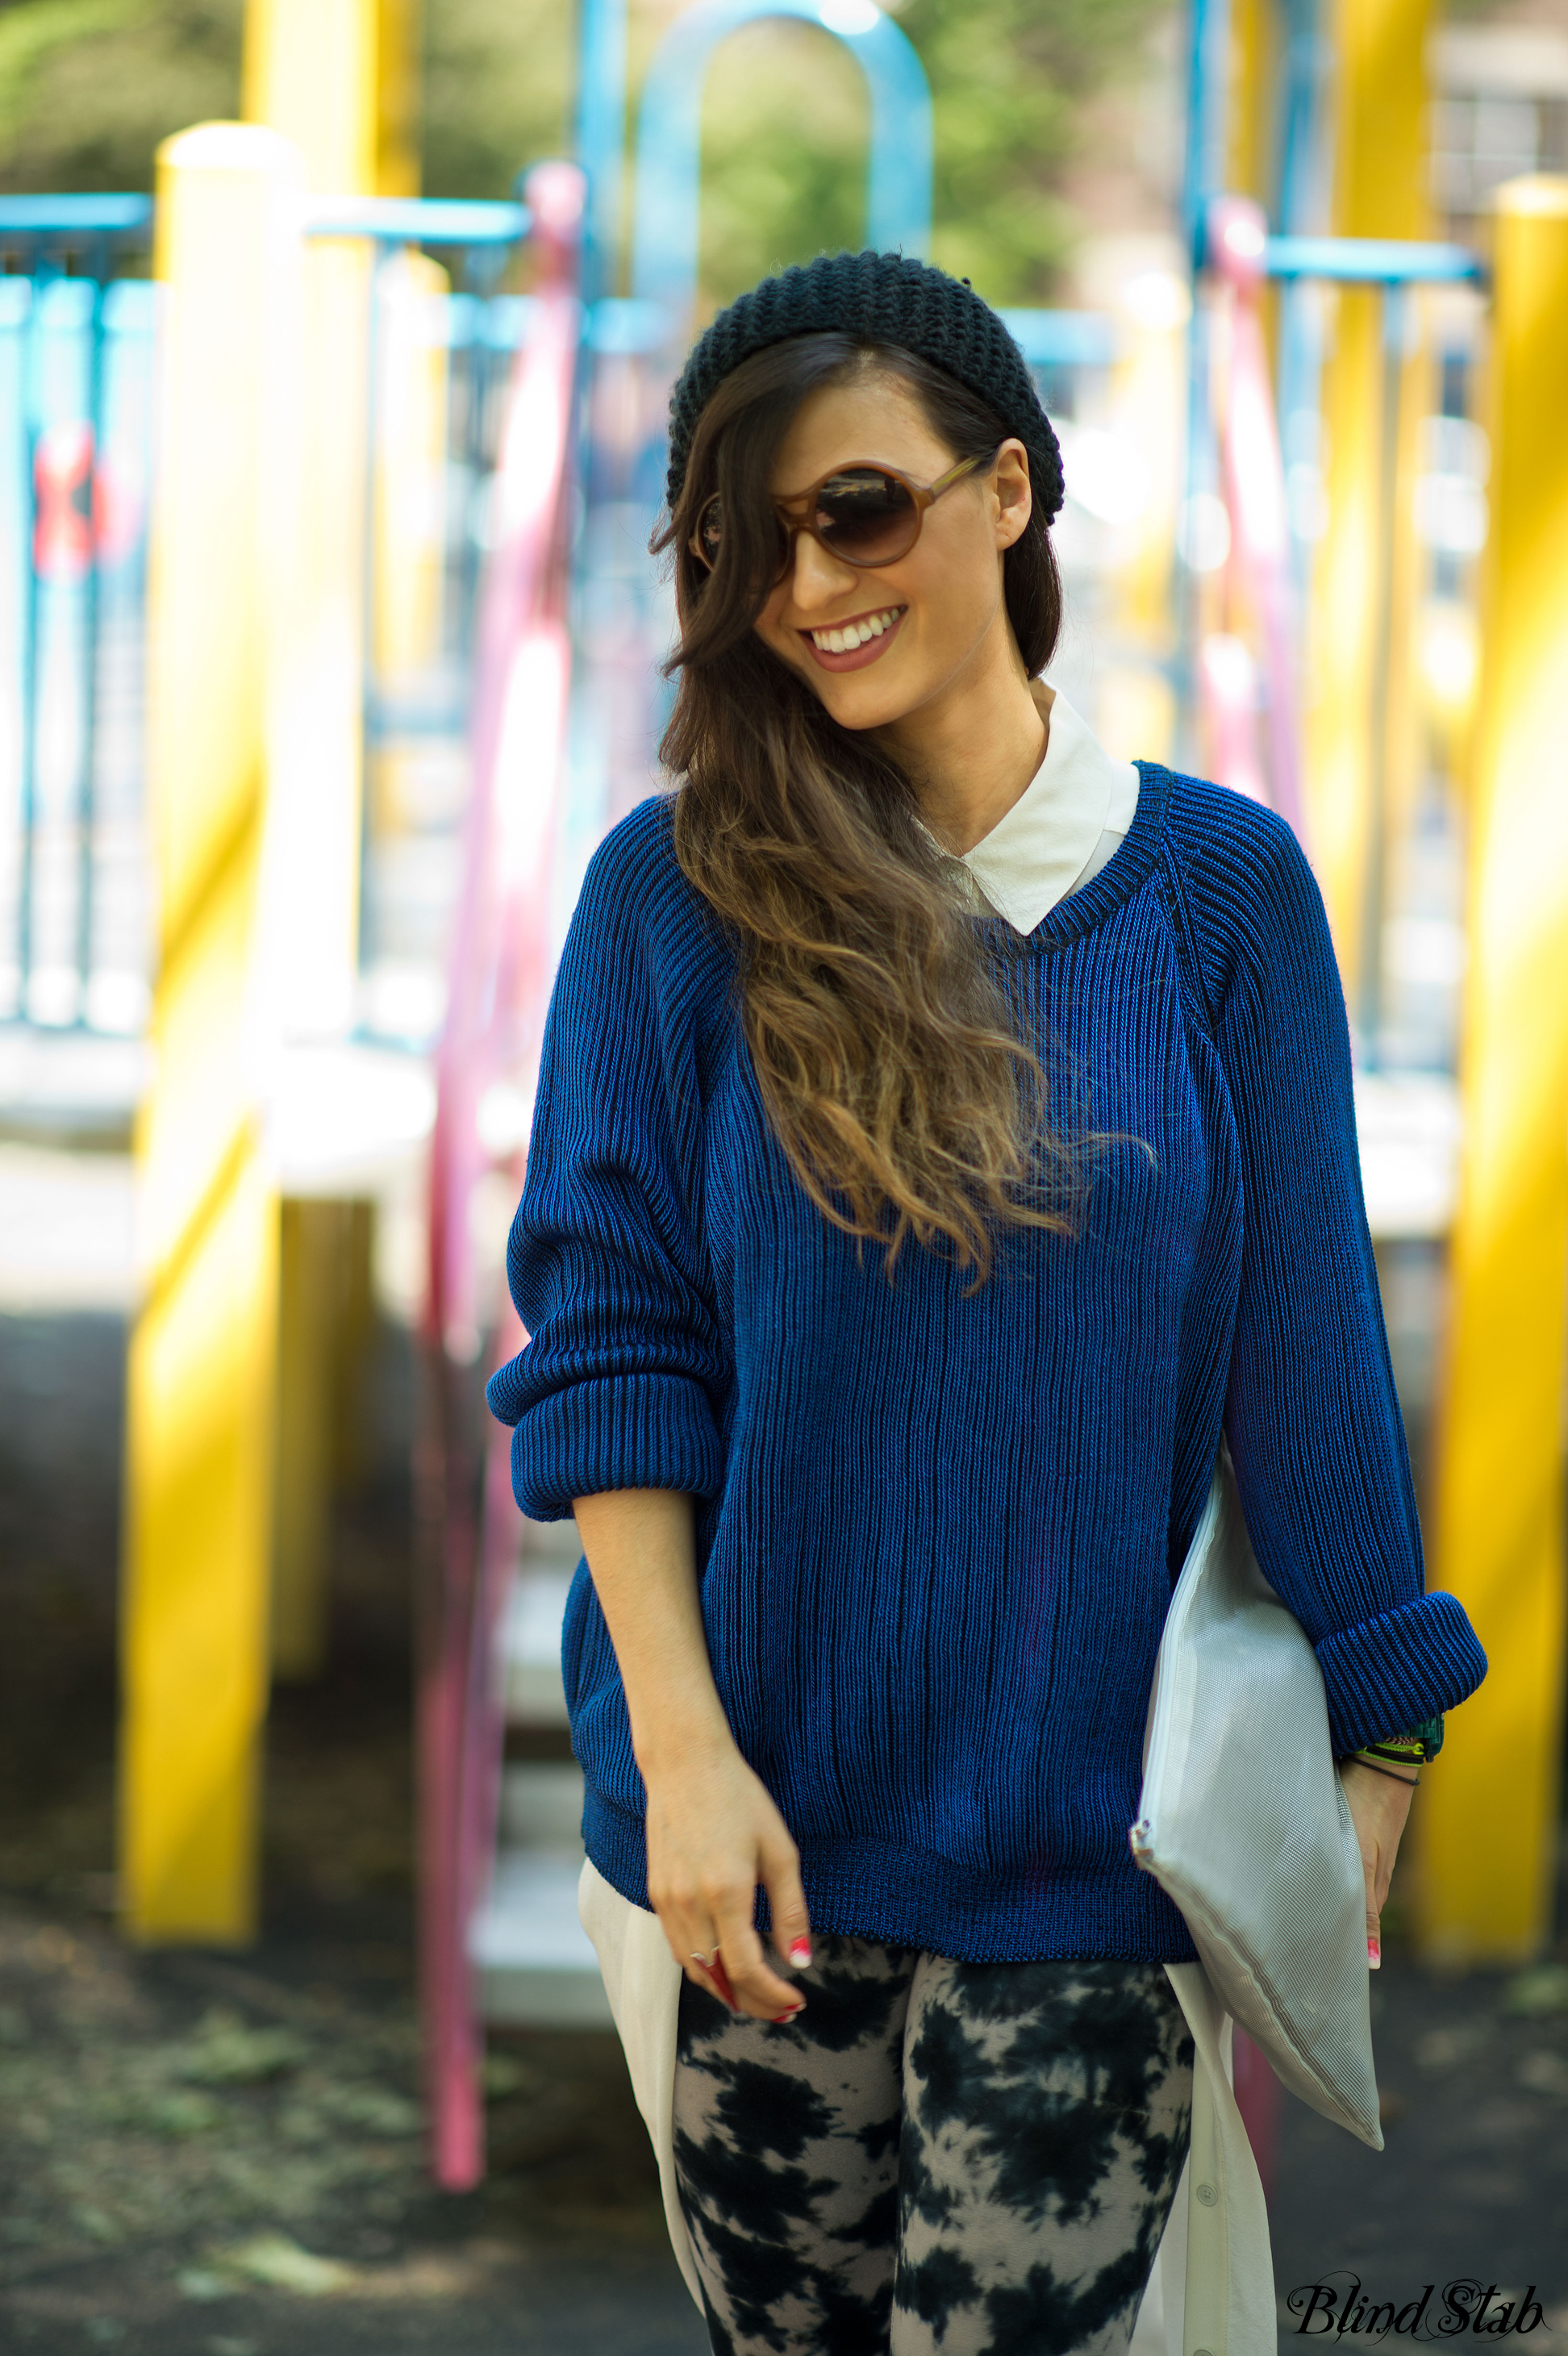 Streetstyle-Blue-Sweater-Fishtail-Skirt